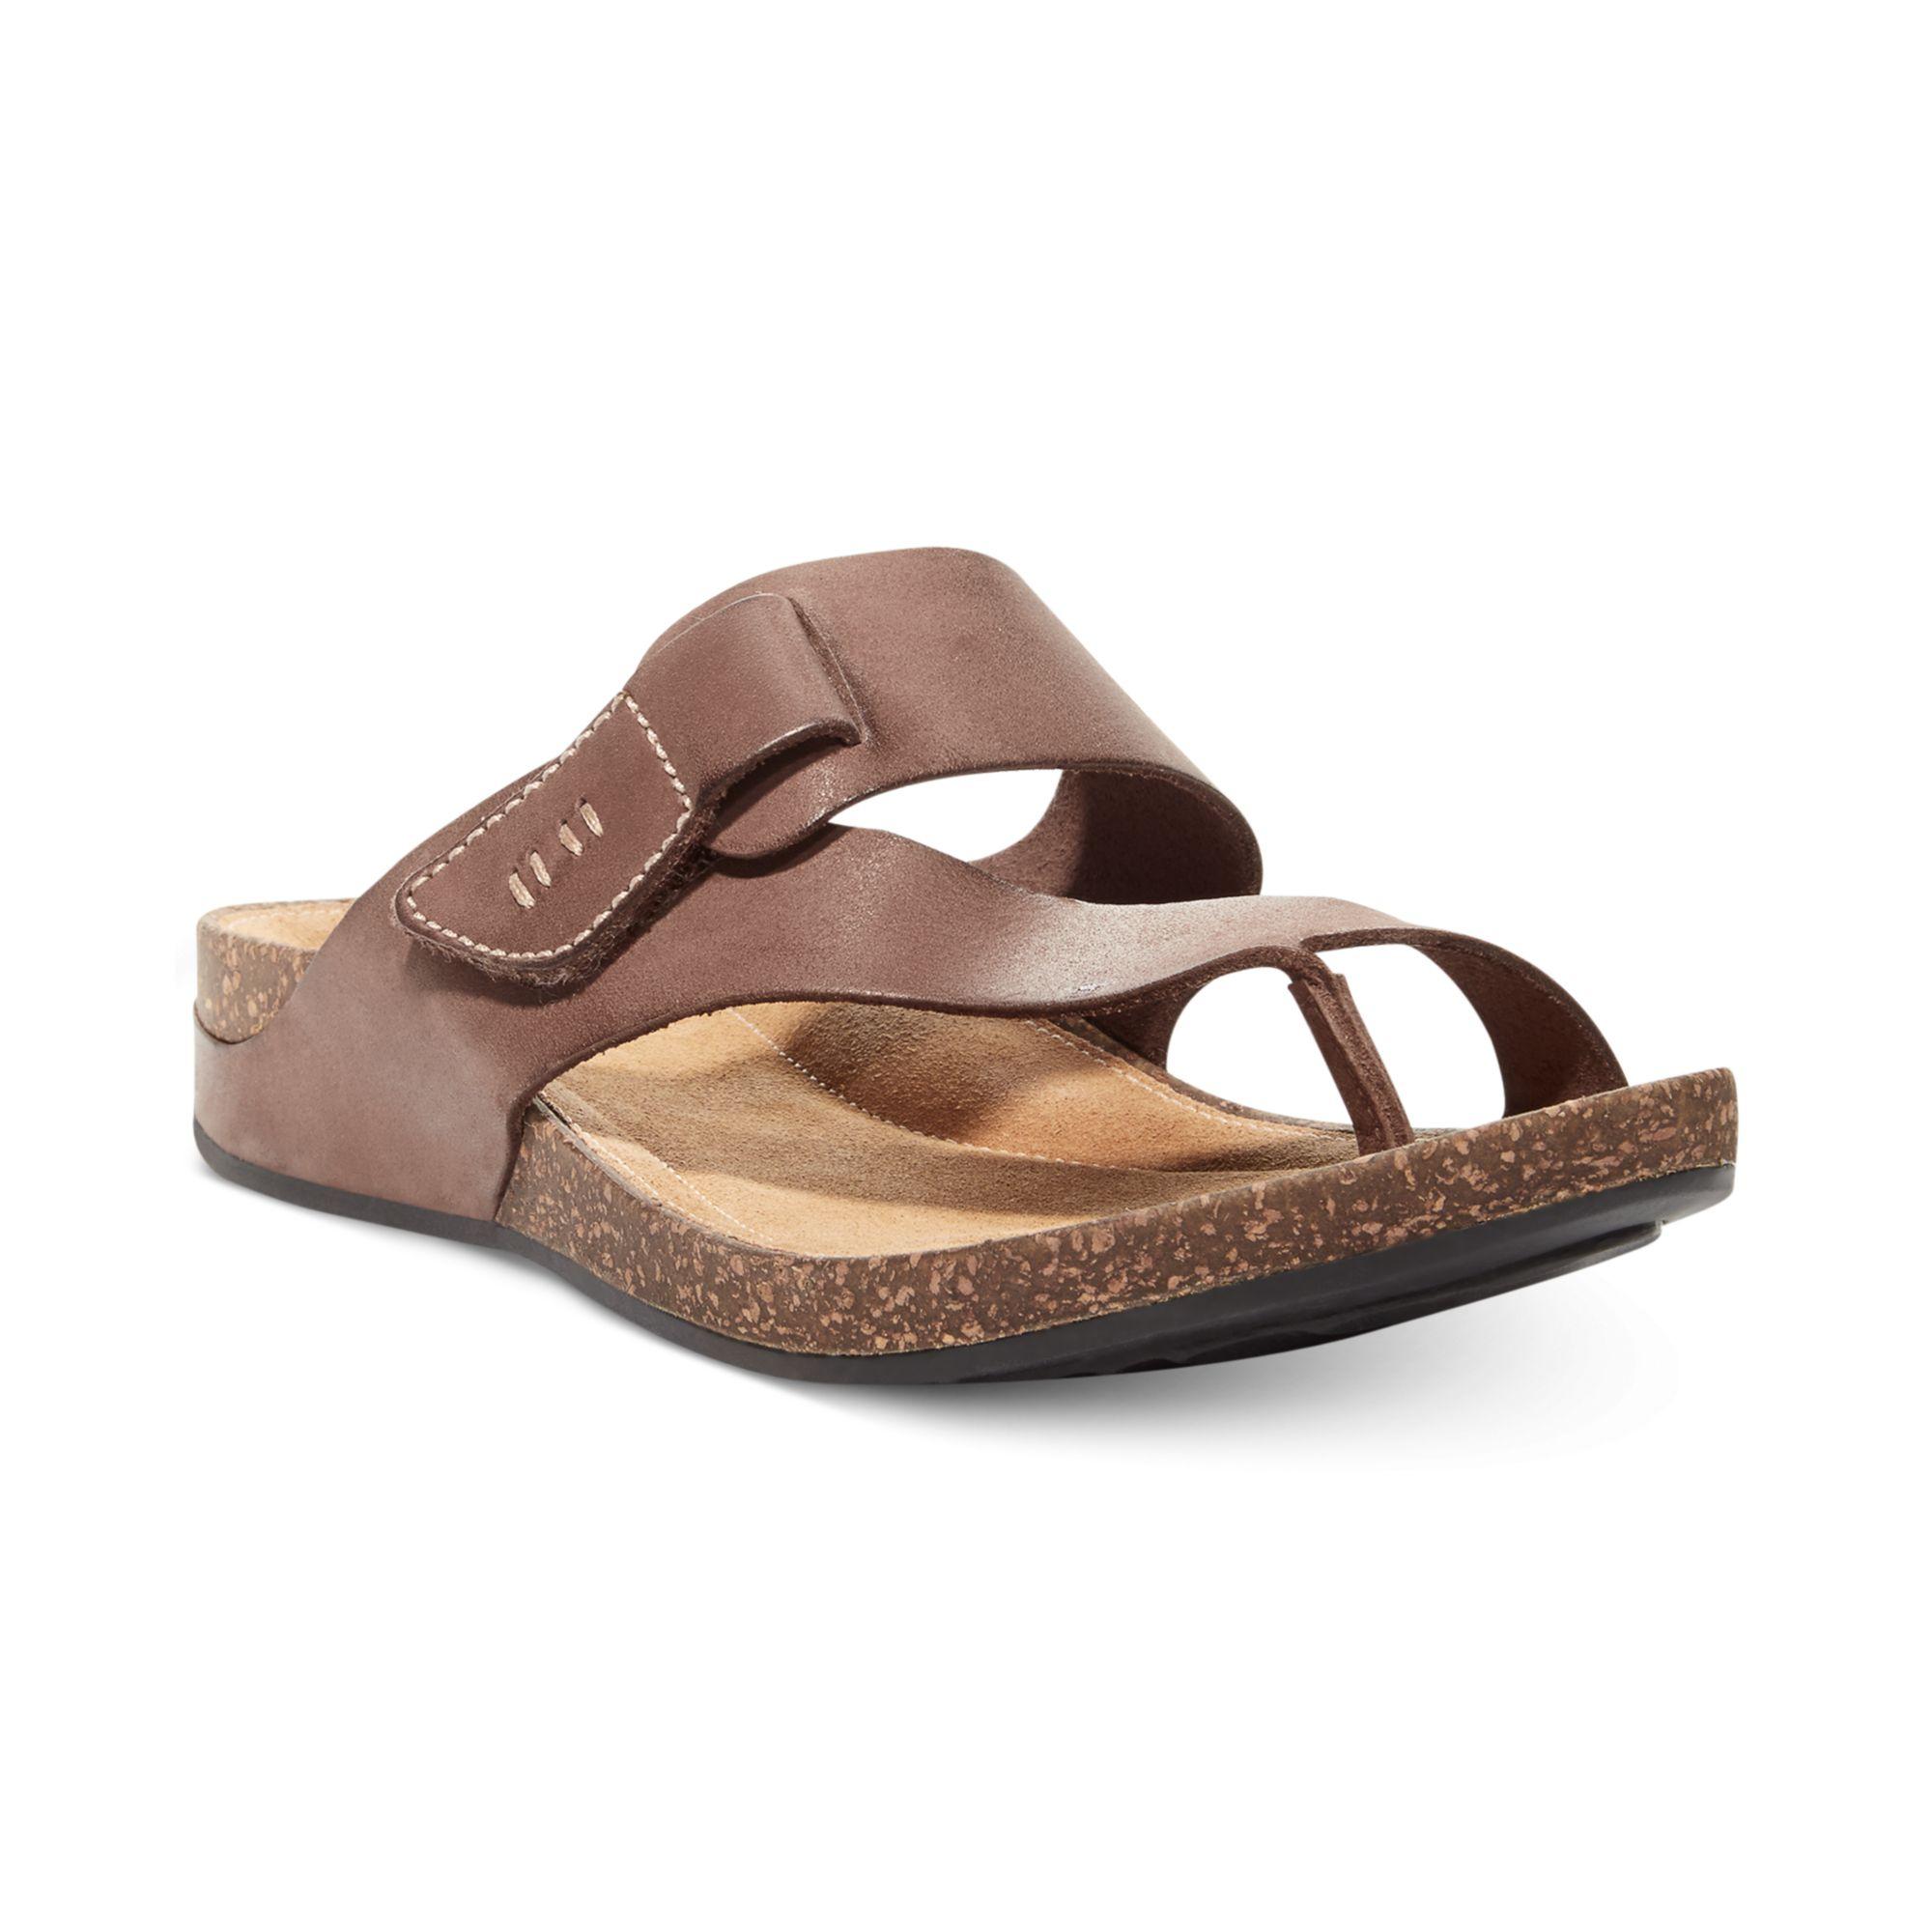 Lyst Clarks Womens Artisan Perri Coast Footbed Sandals